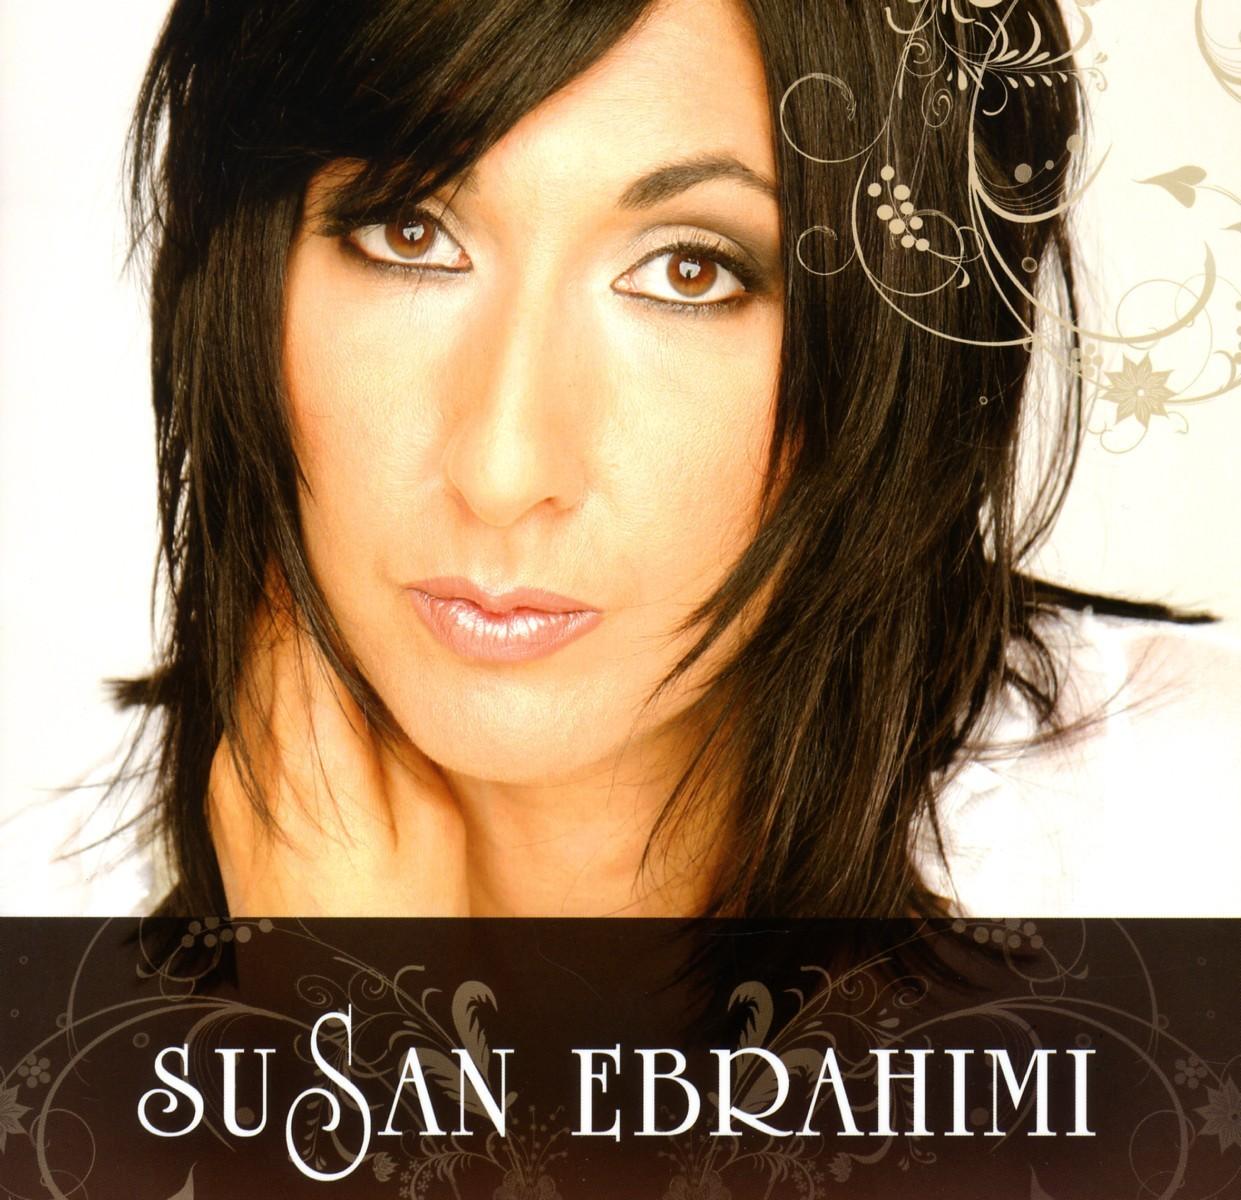 Cover: Comme ci, comme ca, Susan Ebrahimi